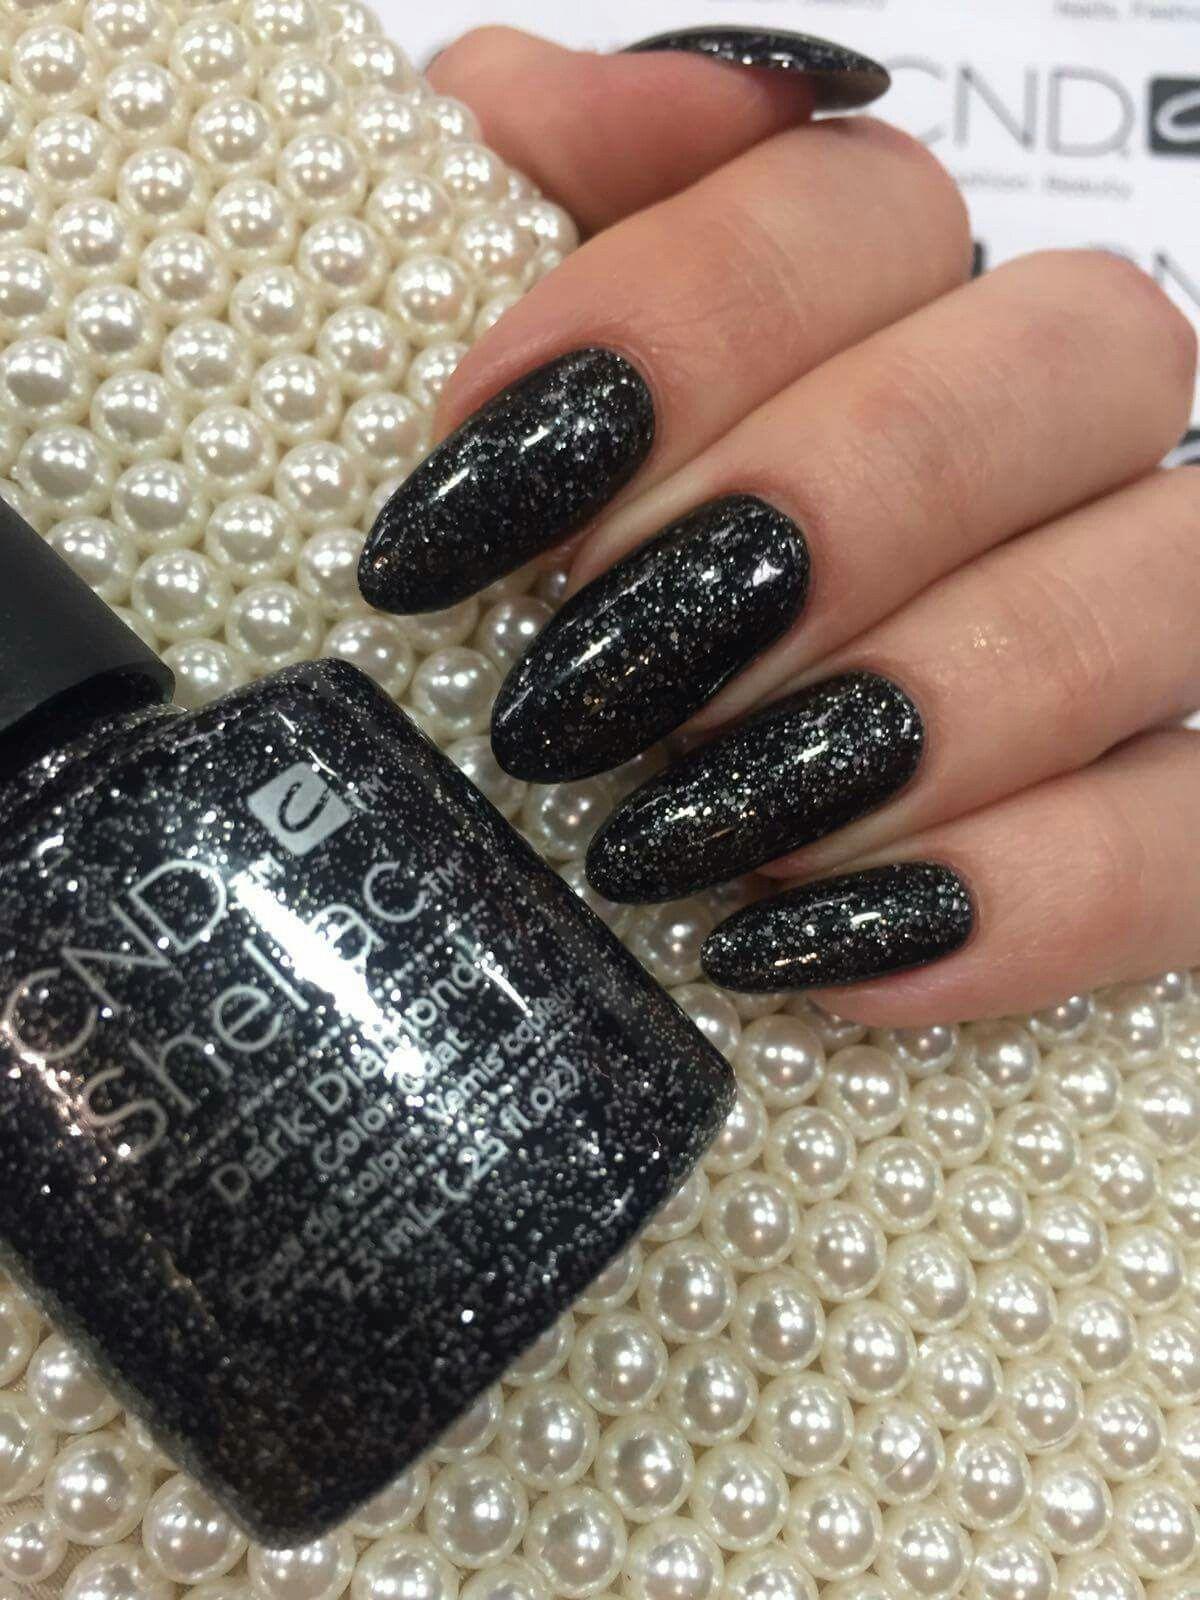 Dark Diamonds Cnd Shellac My Allll Time Fav In 2019 Shellac Nail Colors Nails Nail Colors